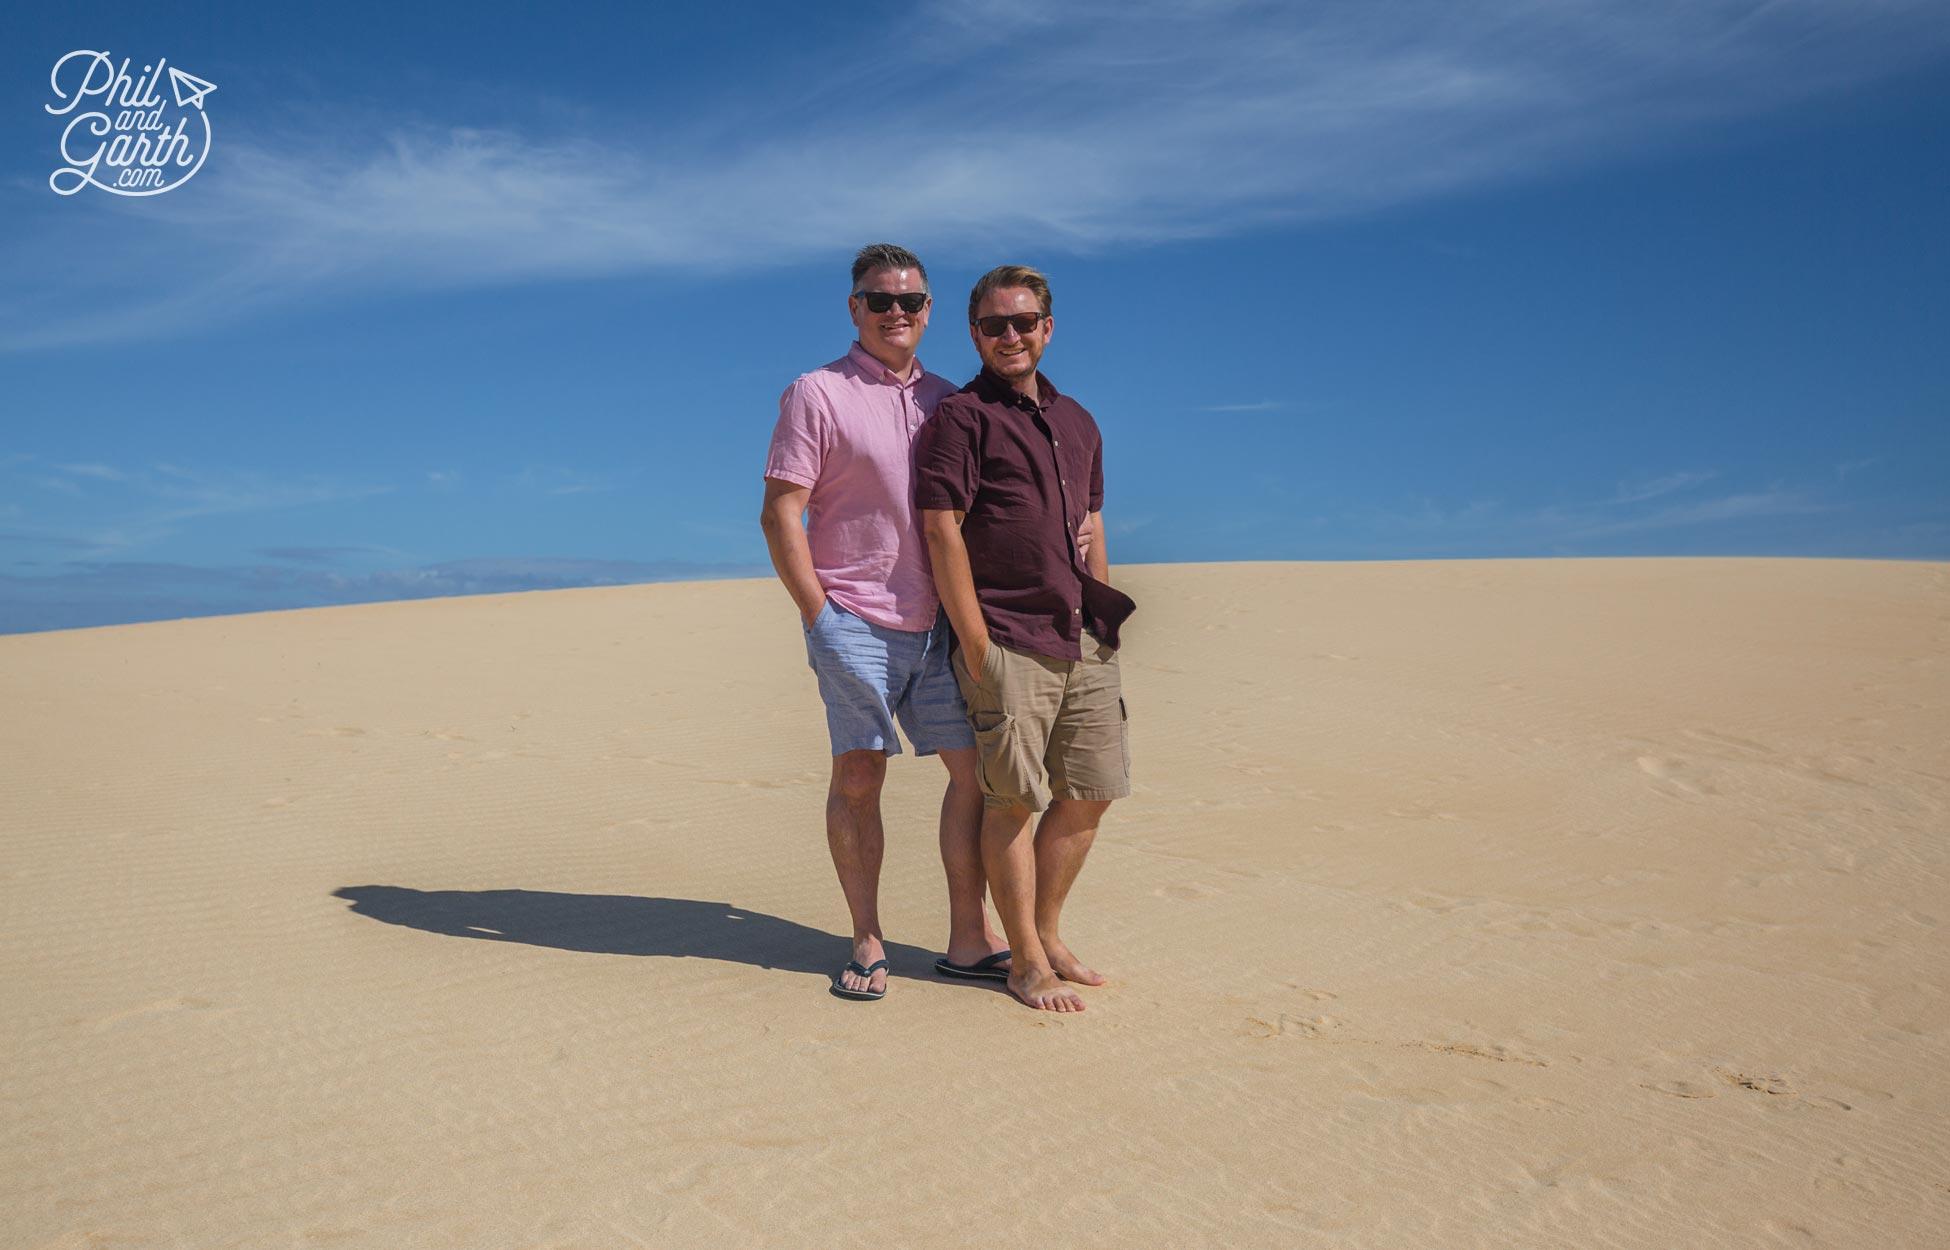 Phil and Garth's Top 5 Fuerteventura Tips